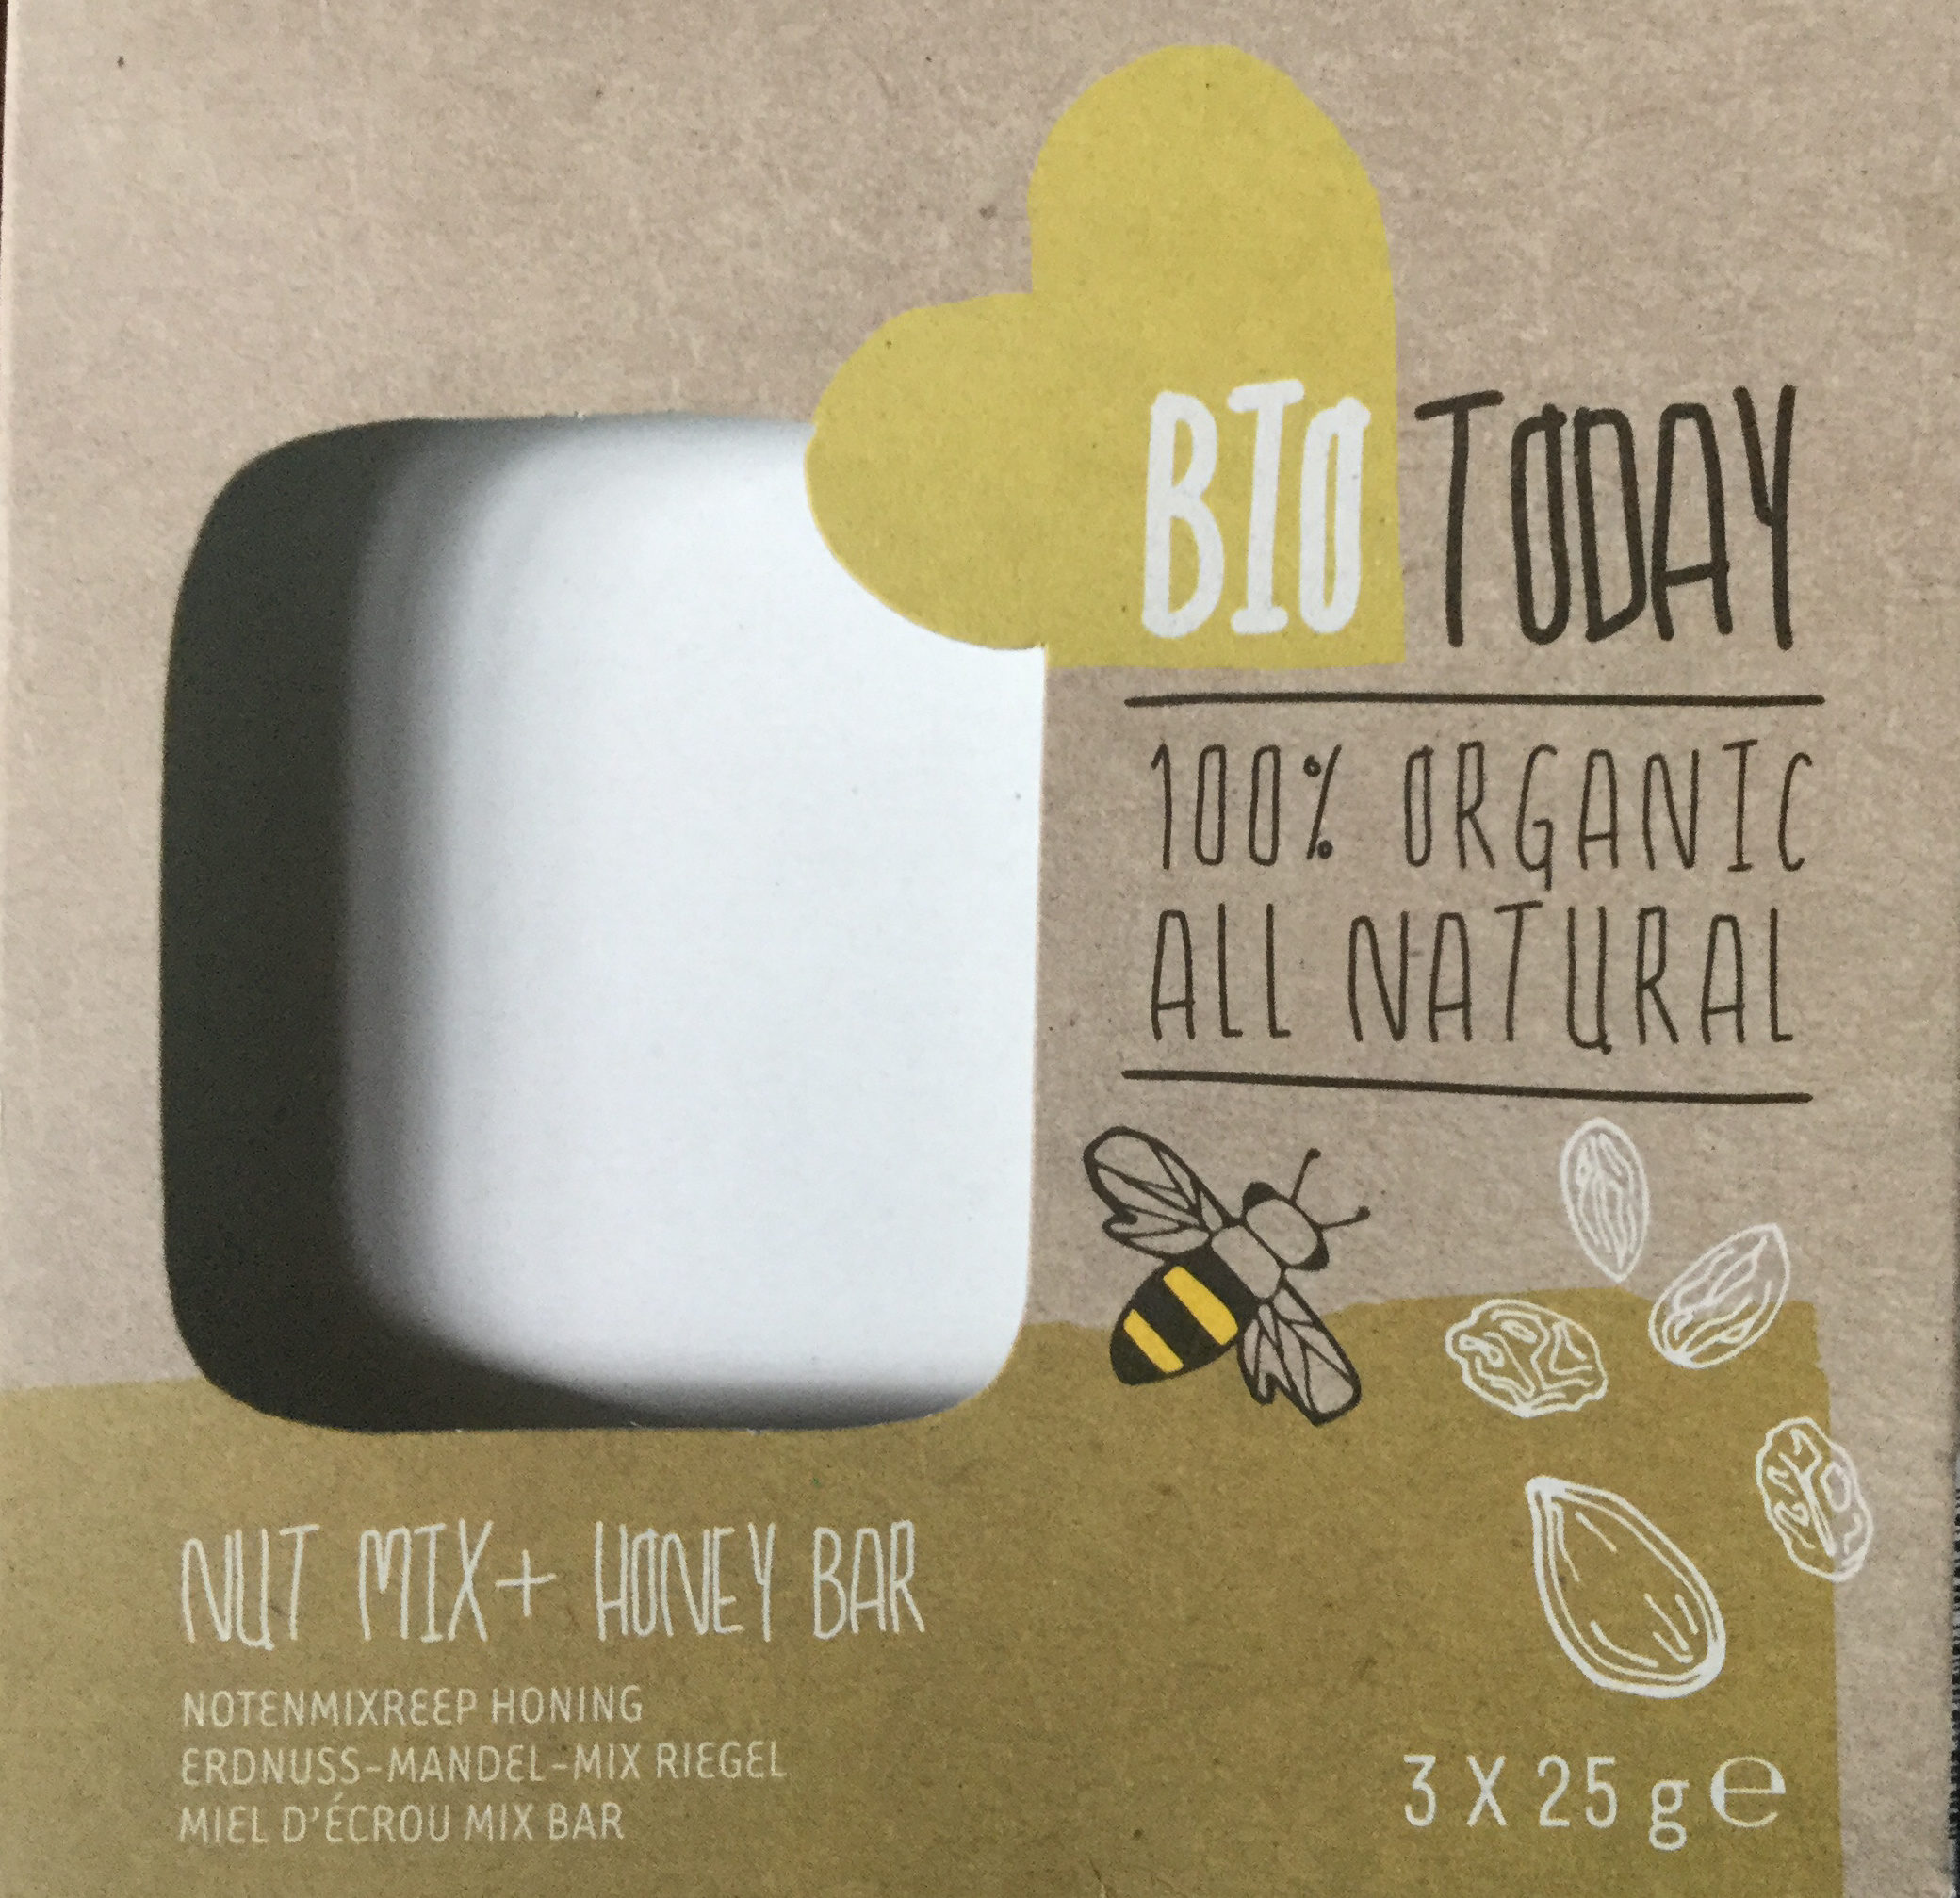 Bio Today Nut Mix + Honey Bar (notenmixreep Honing) - Product - en